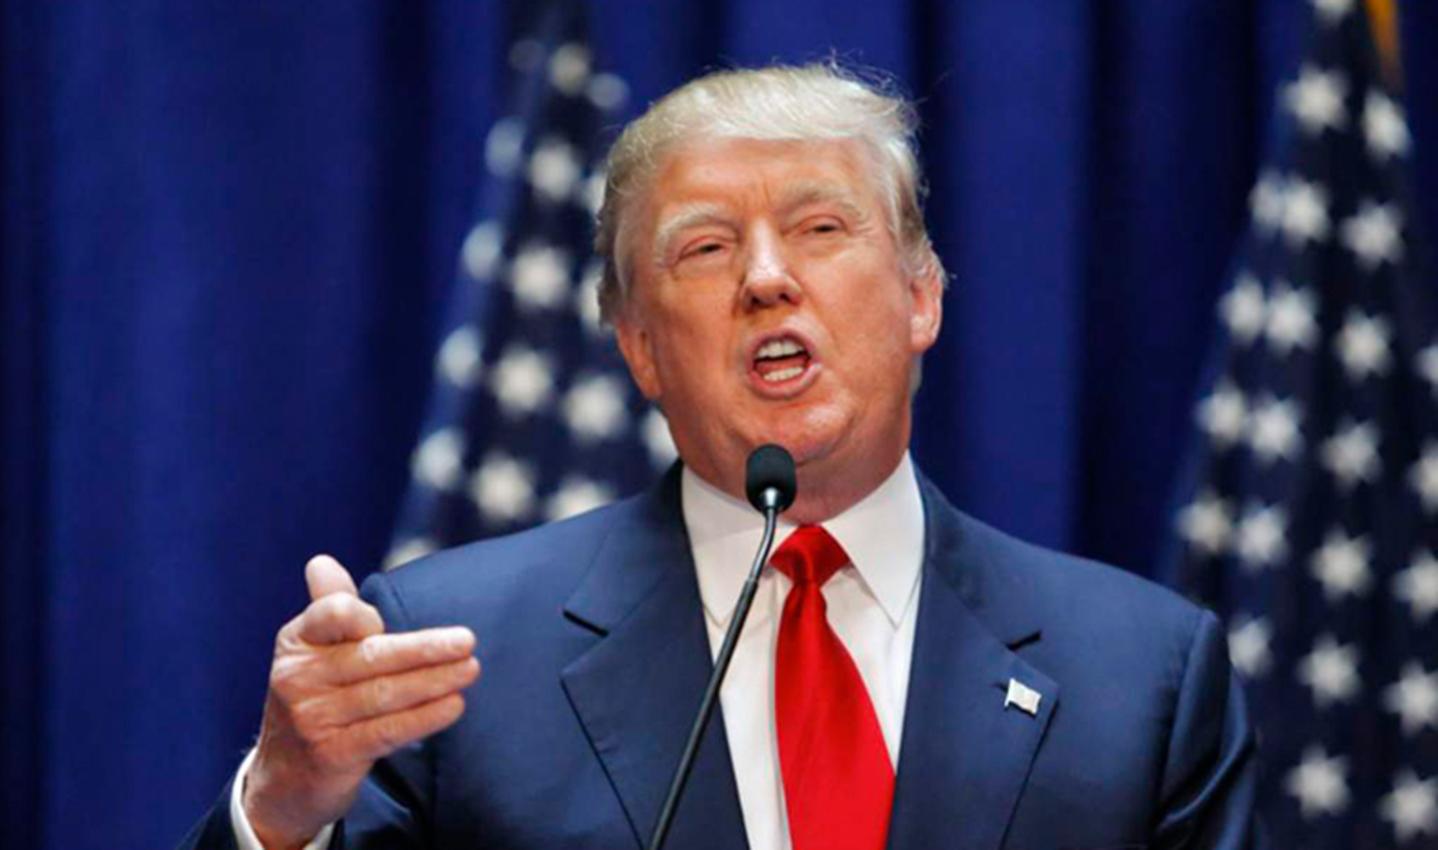 El presidente estadounidense, Donald Trump, acusa a Twitter